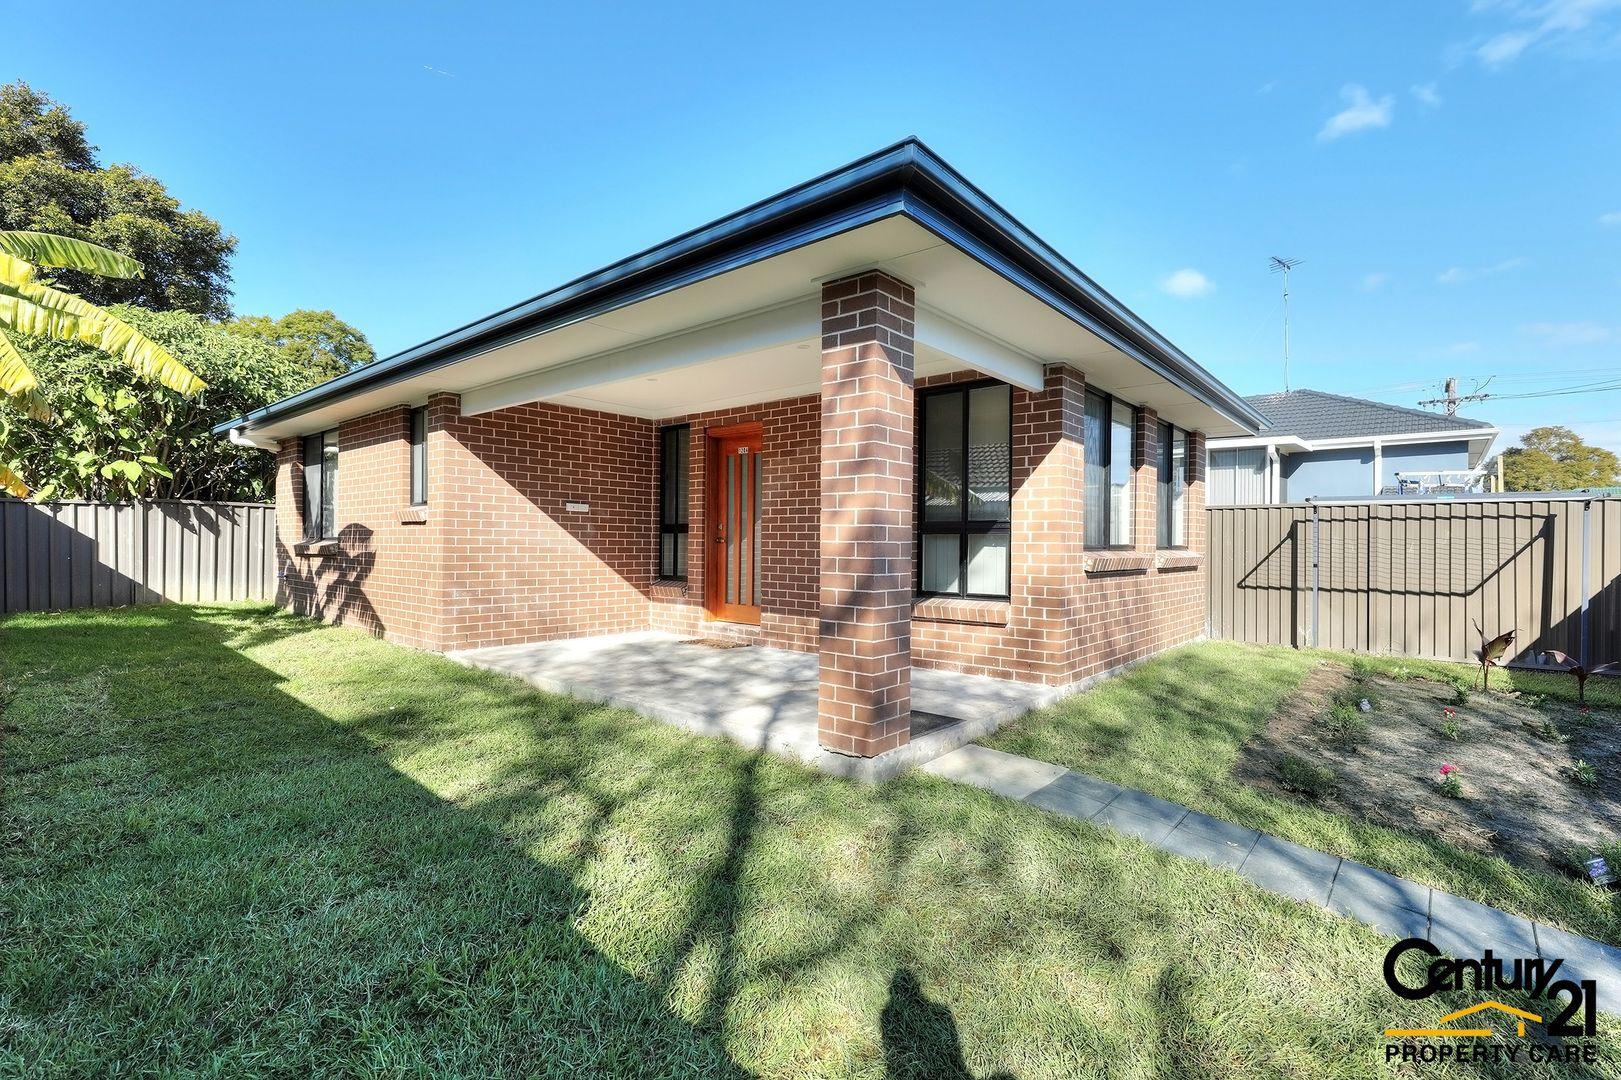 120A O'sullivan Rd, Leumeah NSW 2560, Image 0